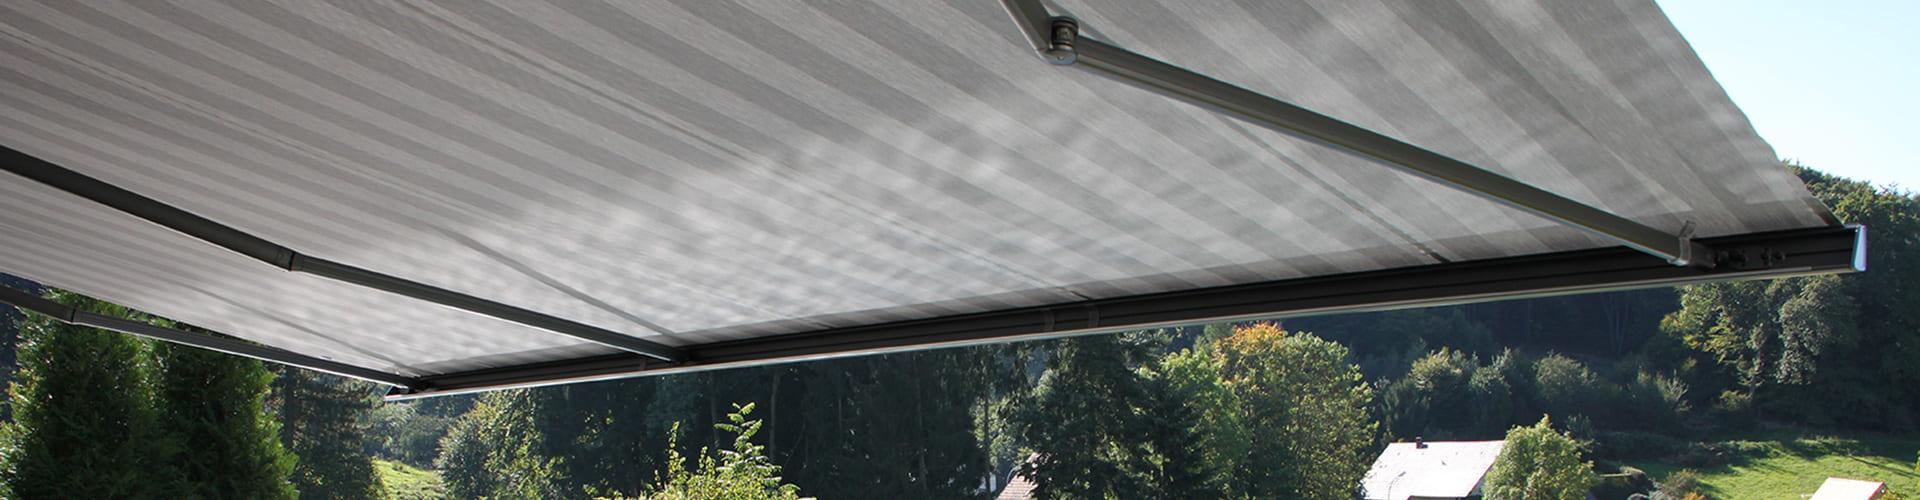 Terrassenmarkise 330